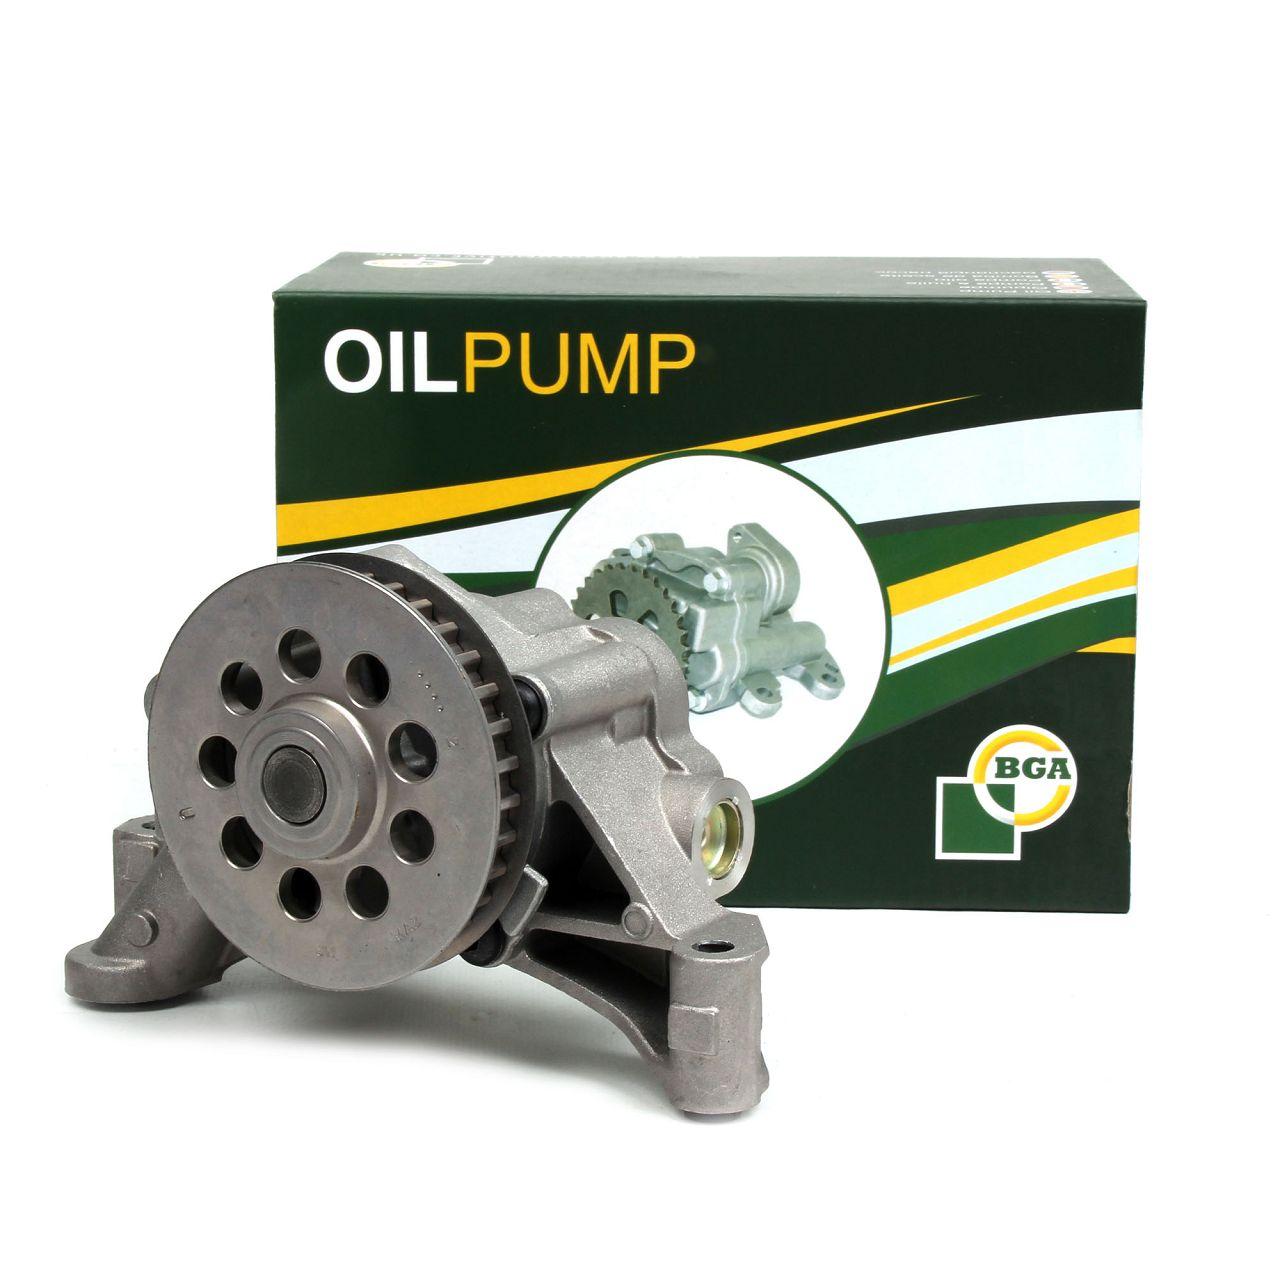 Ölpumpe für AUDI A1 A3 SEAT IBIZA SKODA OCTAVIA GOLF 6 PASSAT T5 T6 1.6/2.0 TDI